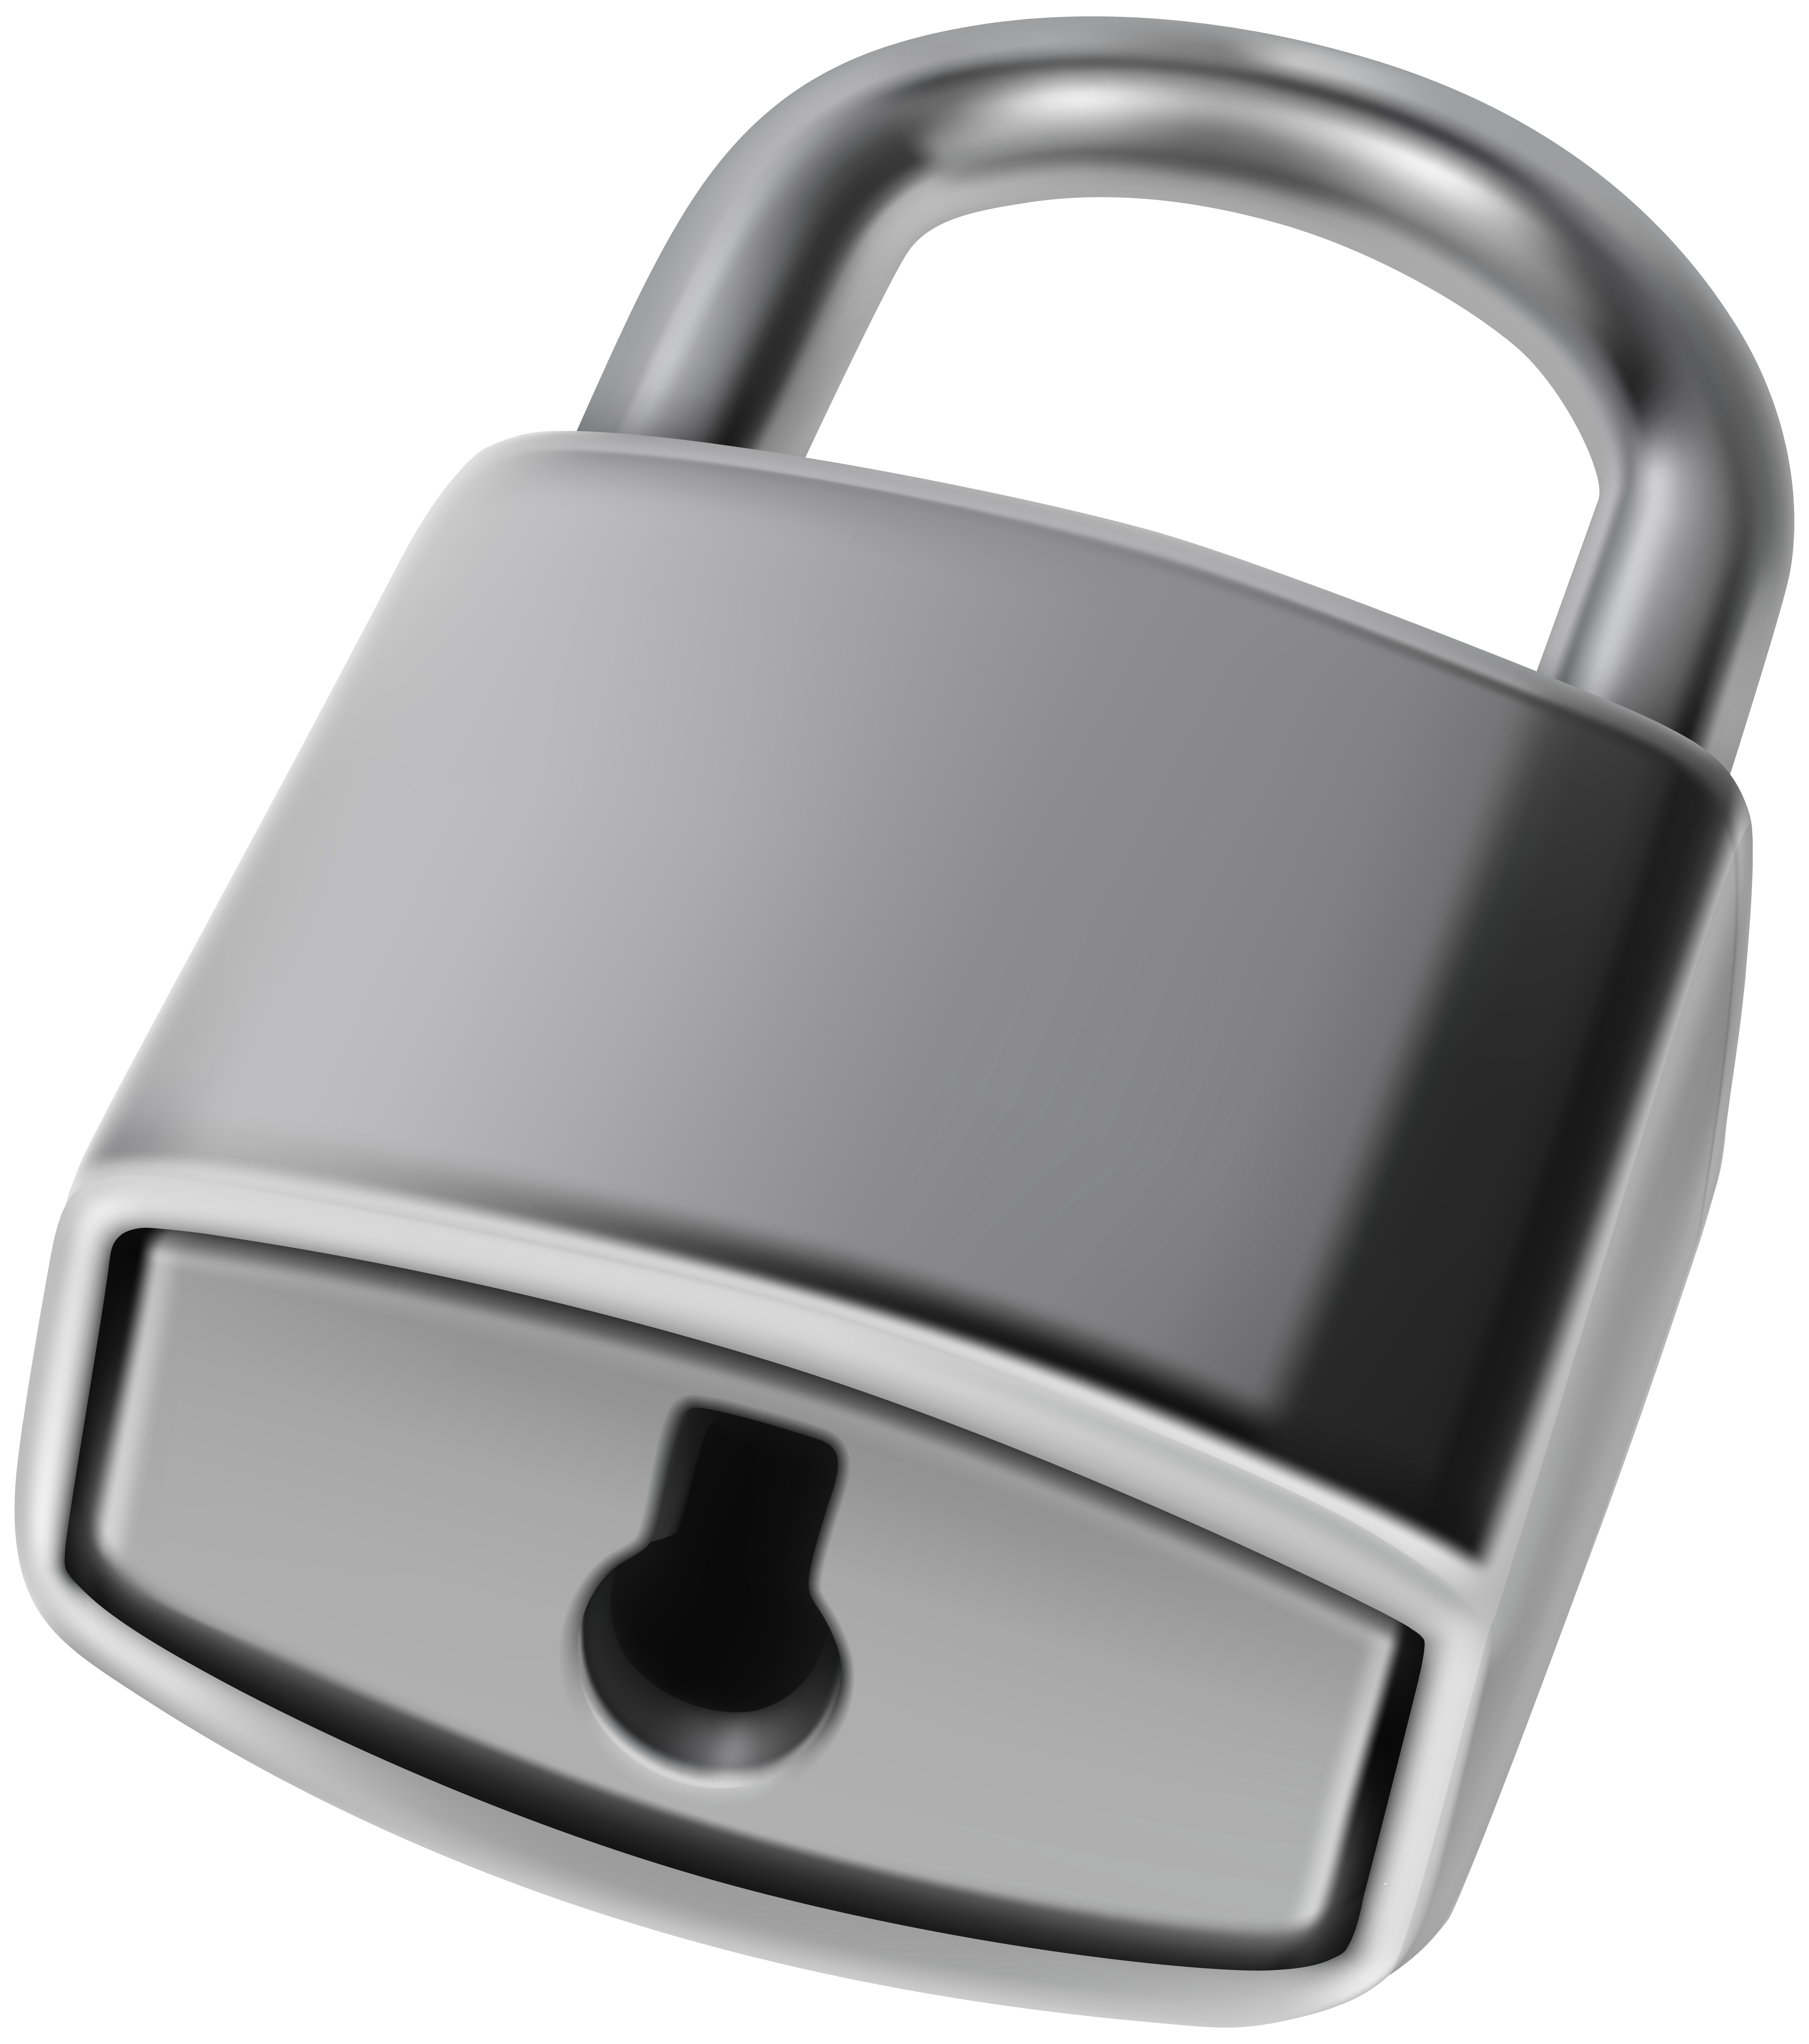 Money clipart lock. Padlock png clip art